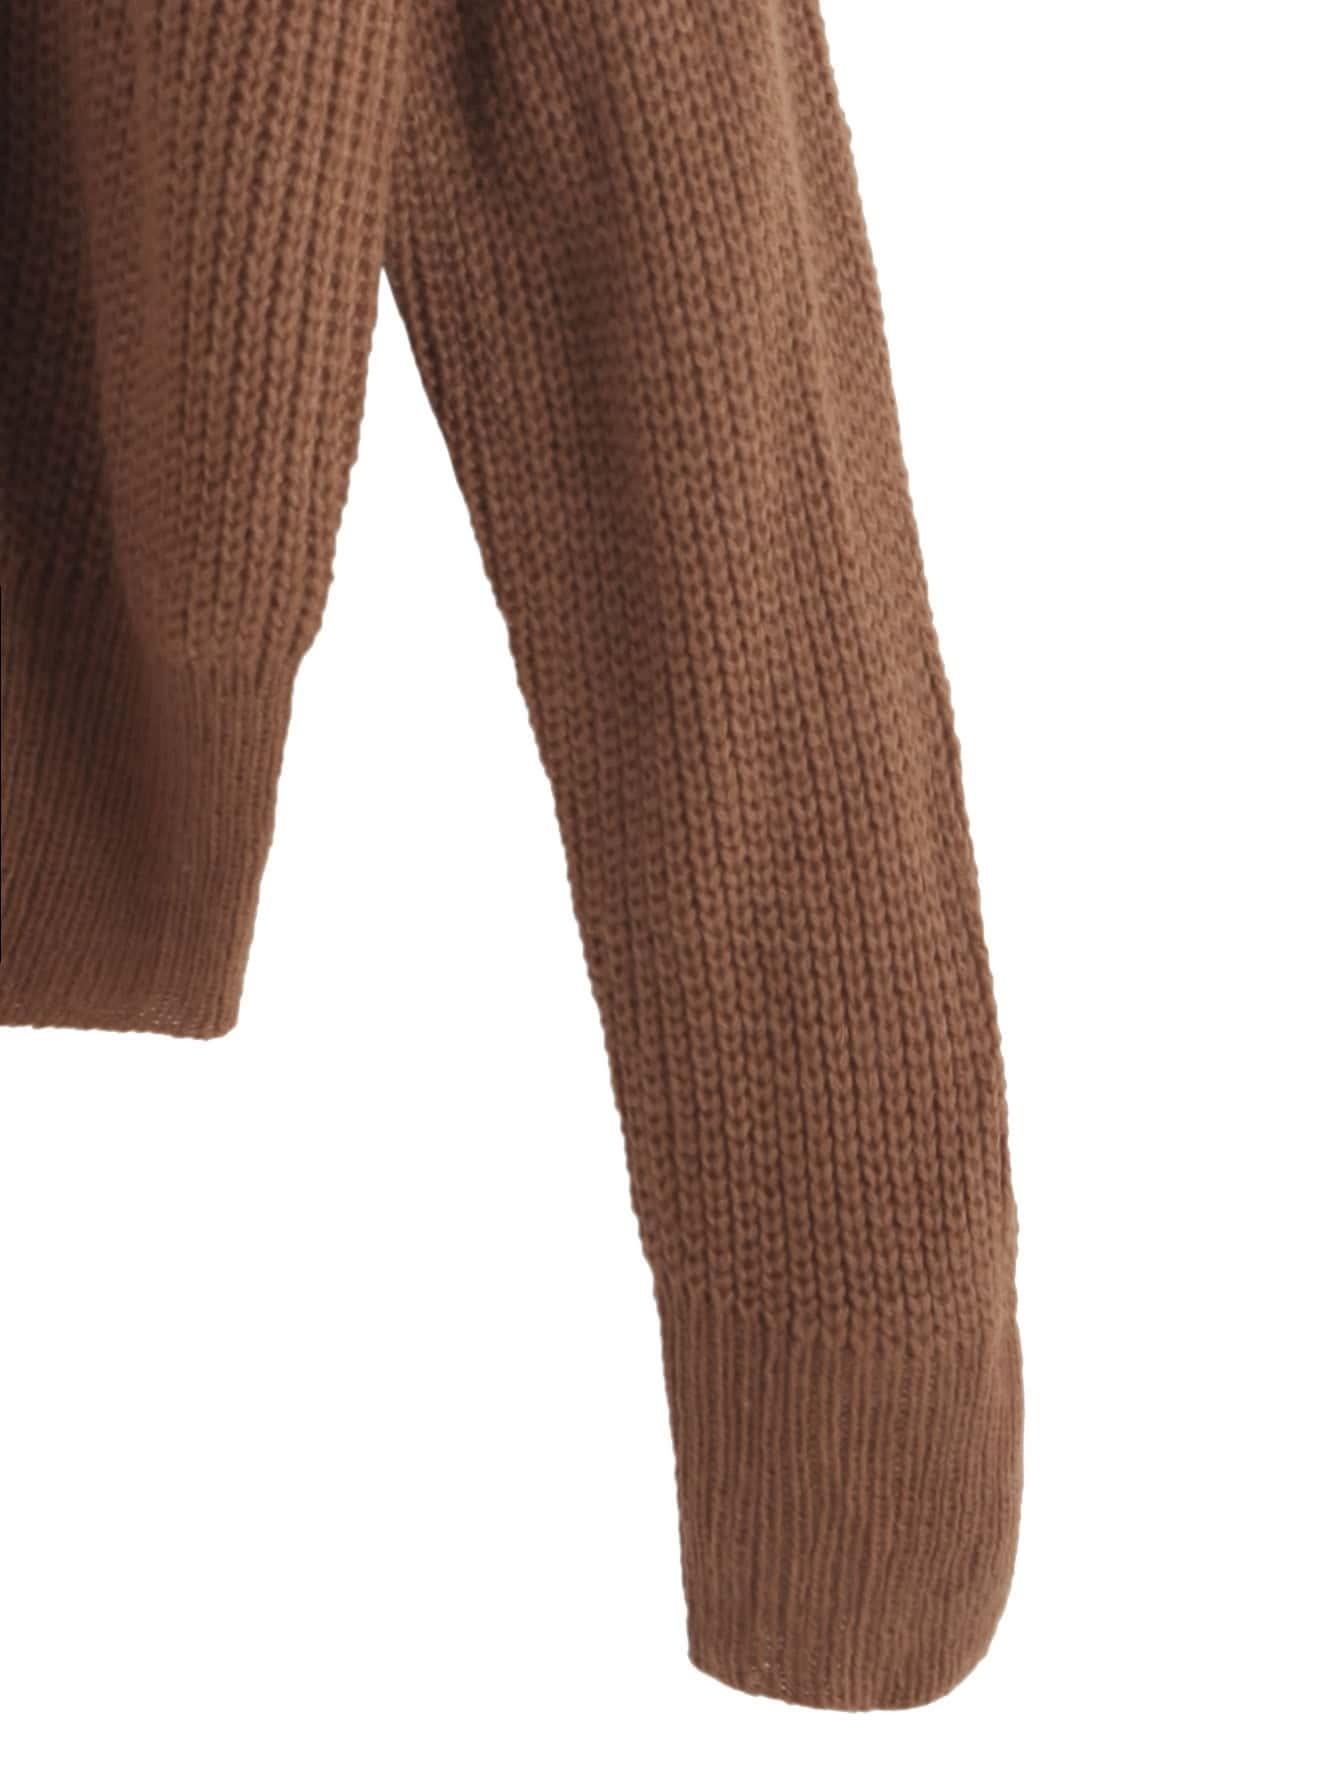 sweater160912301_2